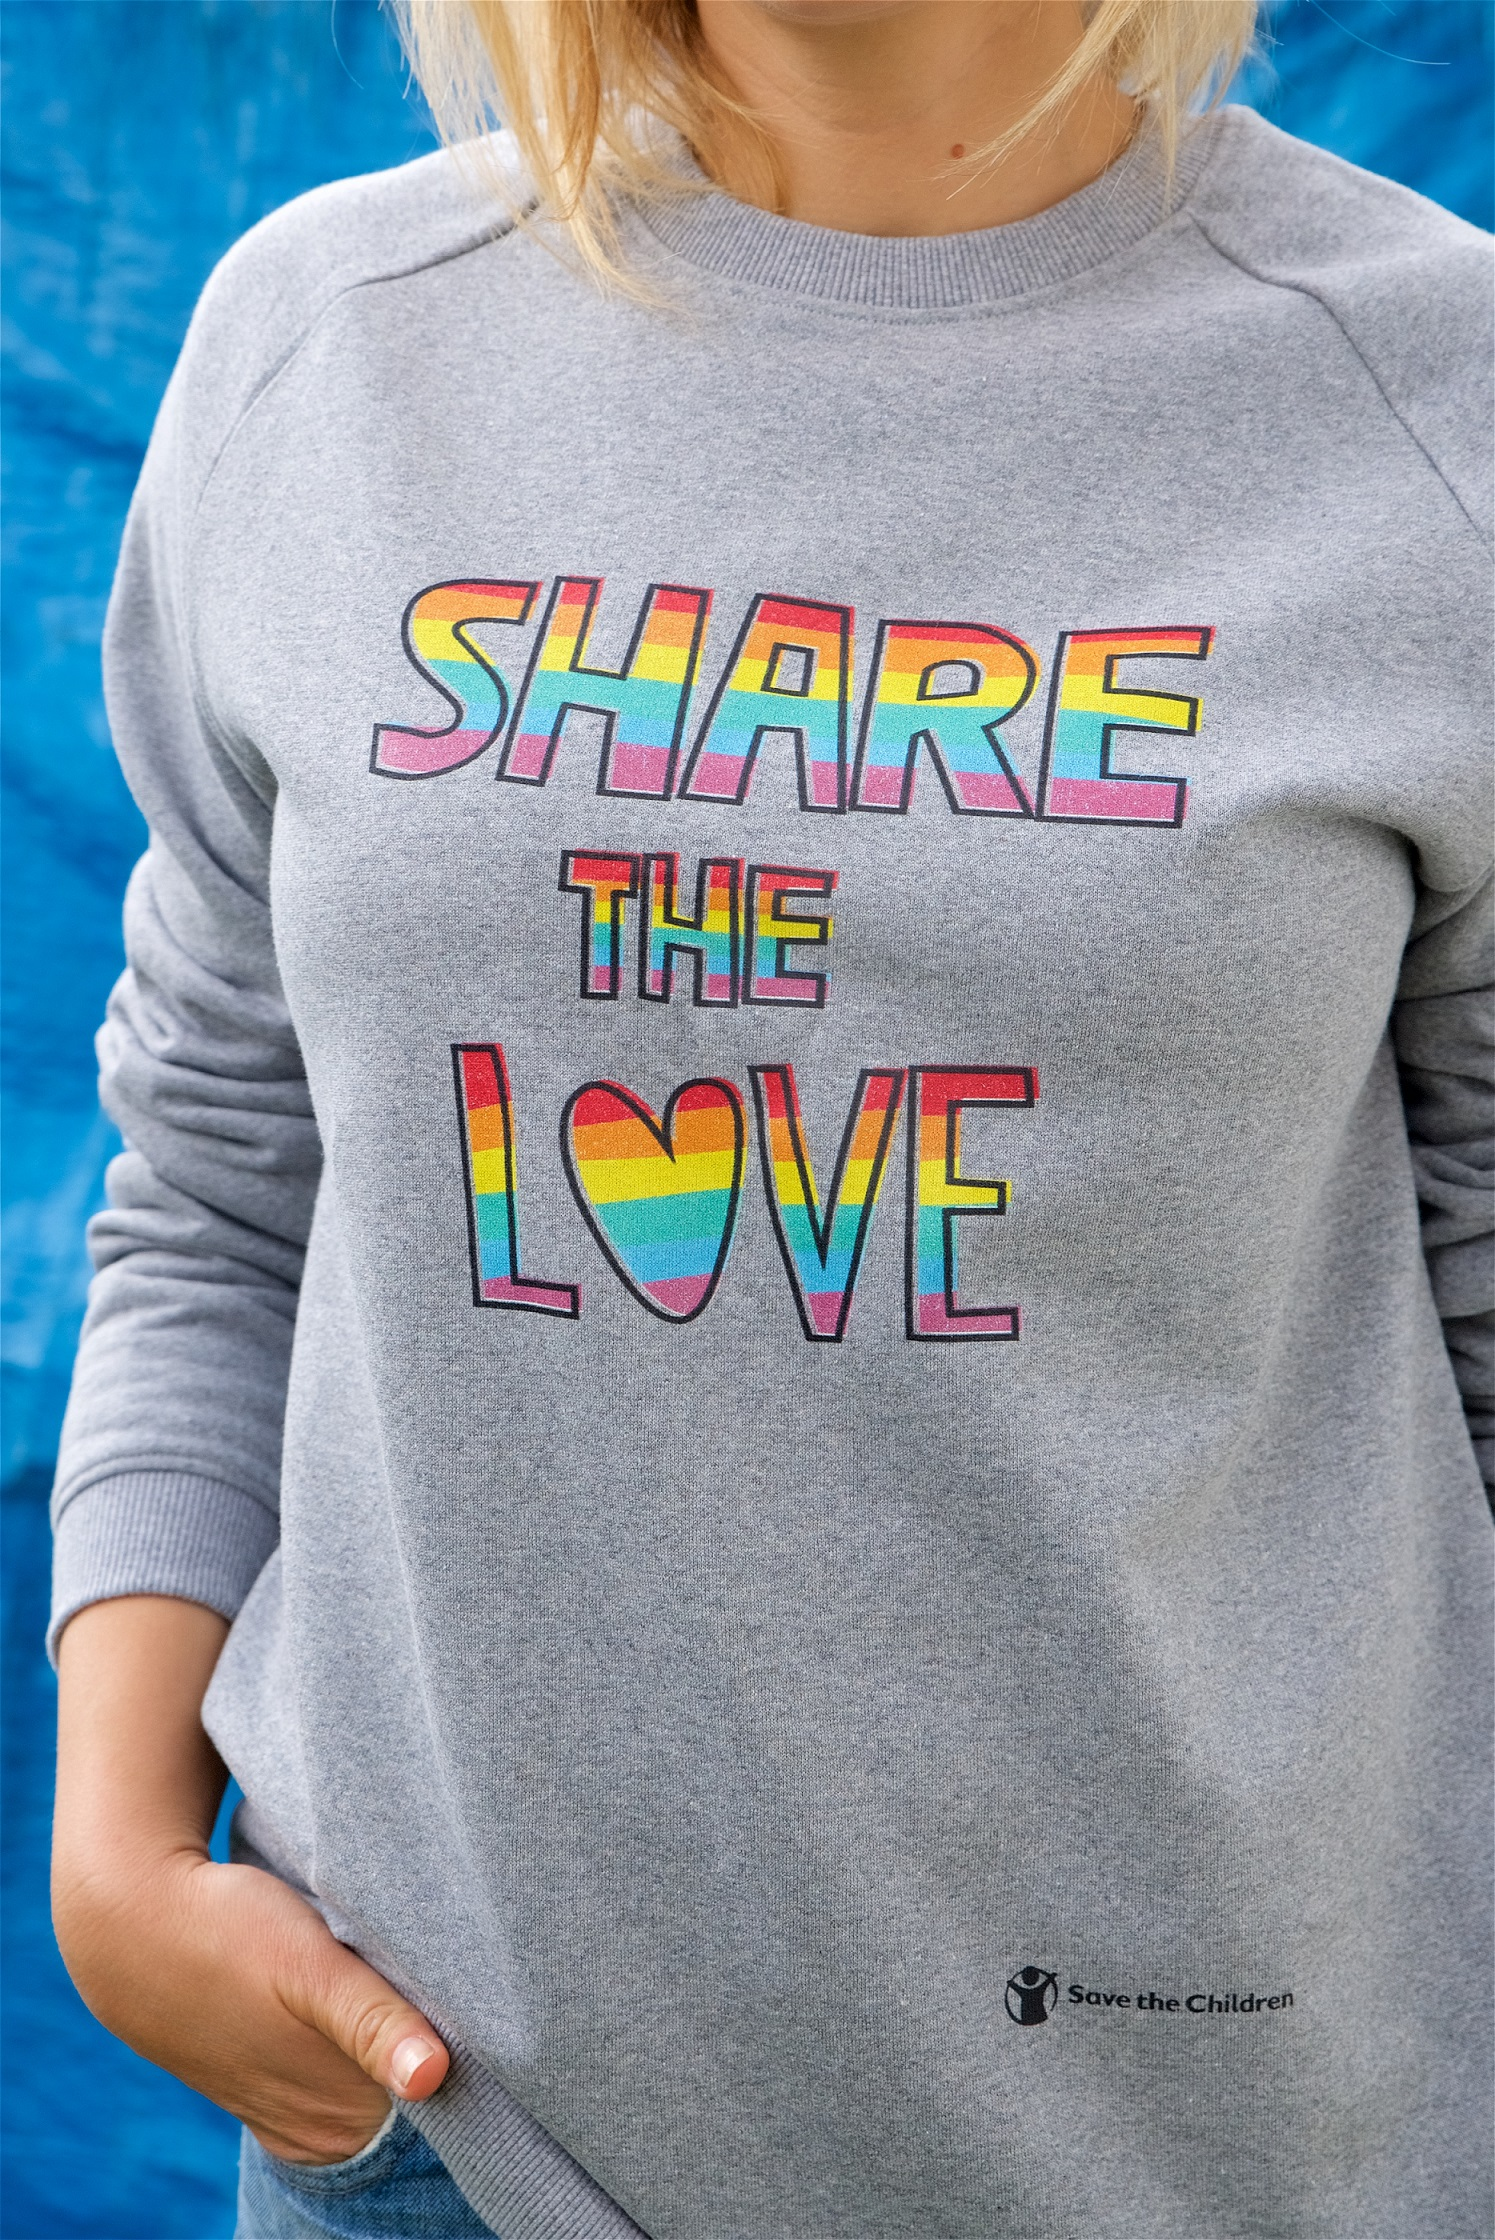 84c17fcb Share The Love Pride Sweatshirt | Save the Children Shop